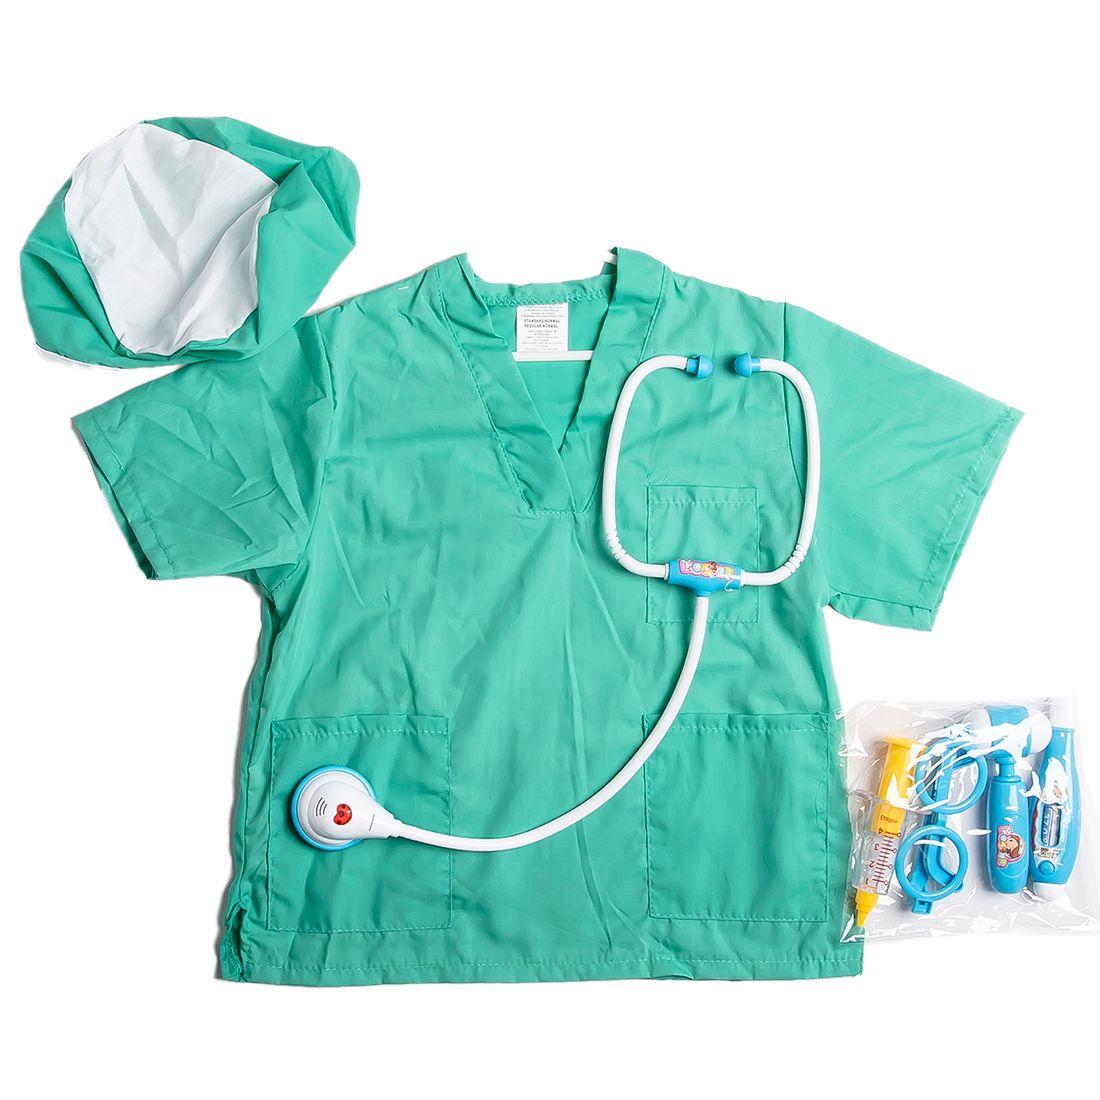 d336aa1c08296 Compre Los Niños Fingen Jugar A Los Juguetes Enfermera